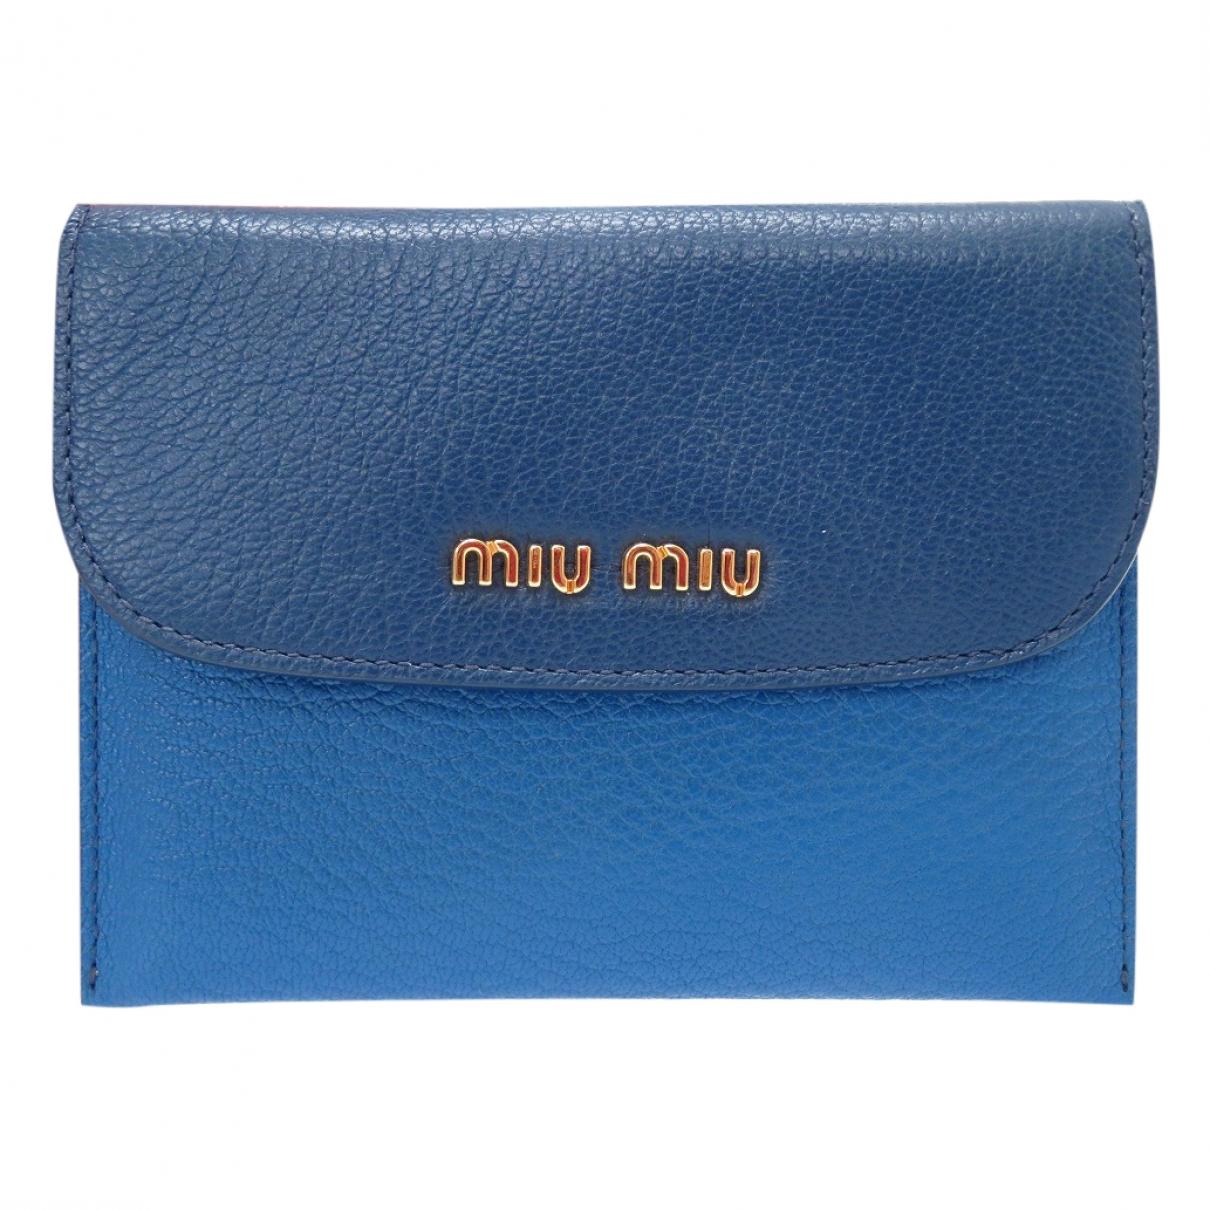 Miu Miu - Petite maroquinerie   pour femme en cuir - bleu